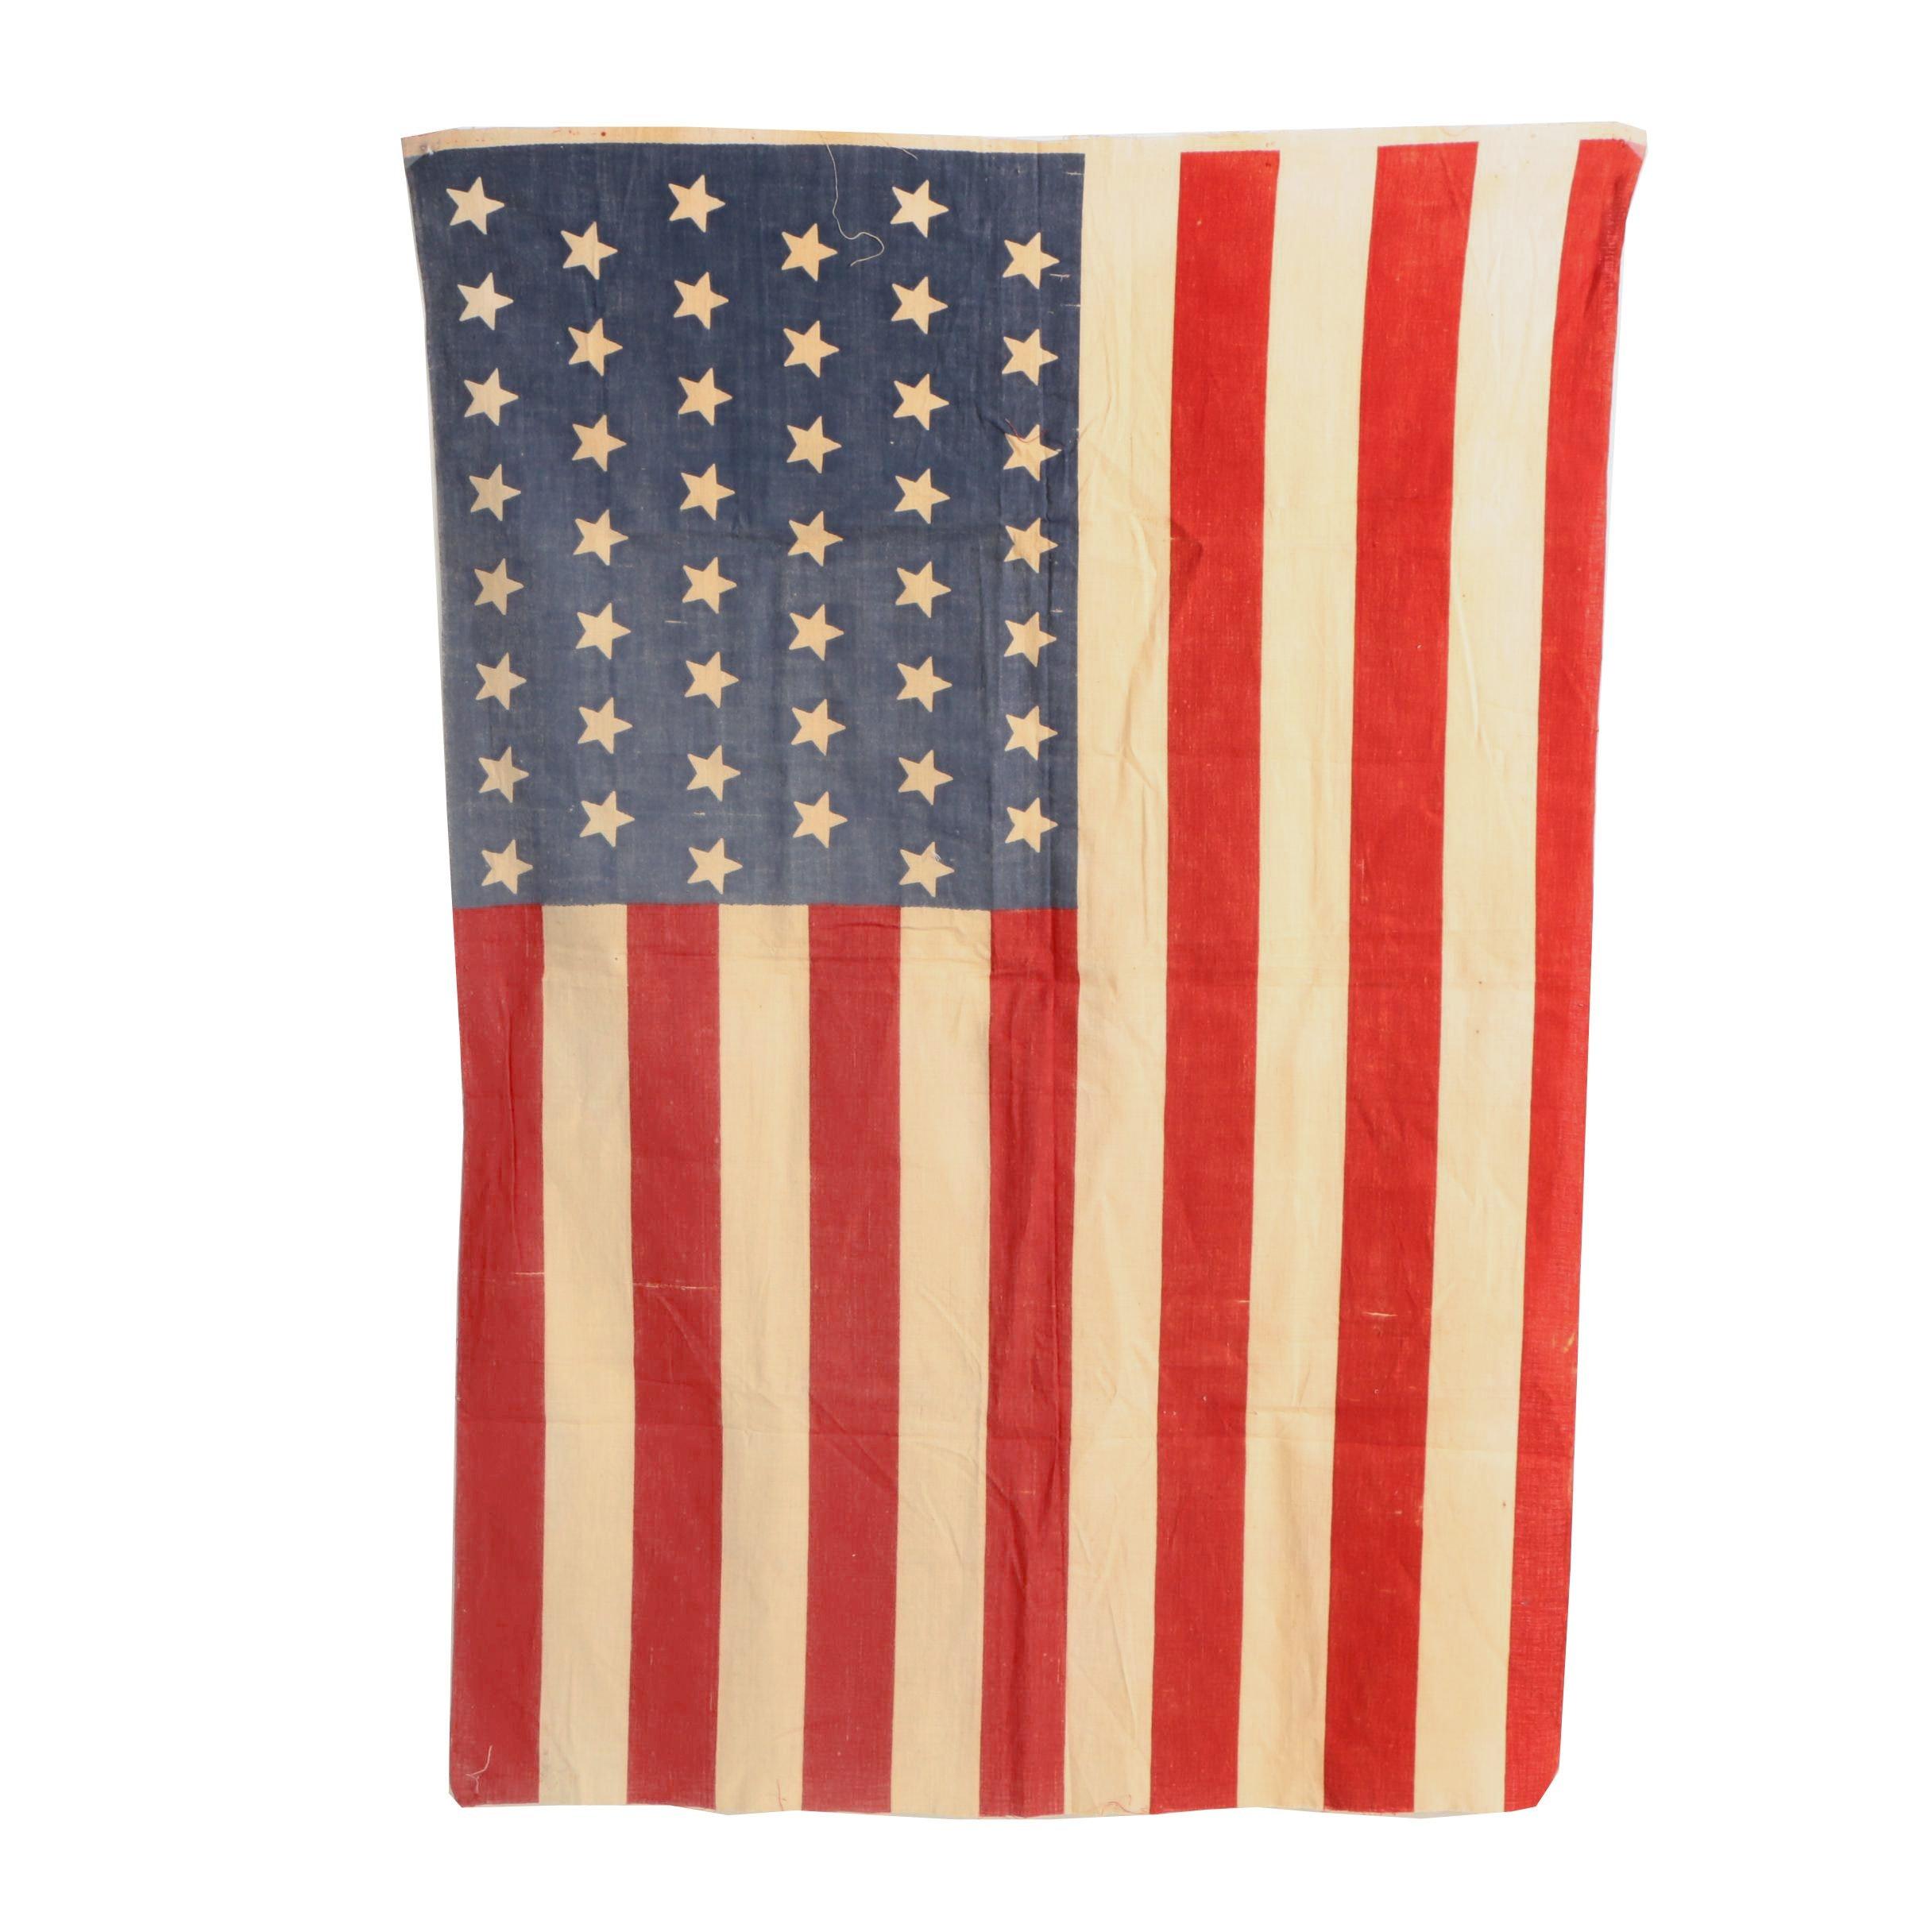 45 Star American Flag, 1896 - 1908